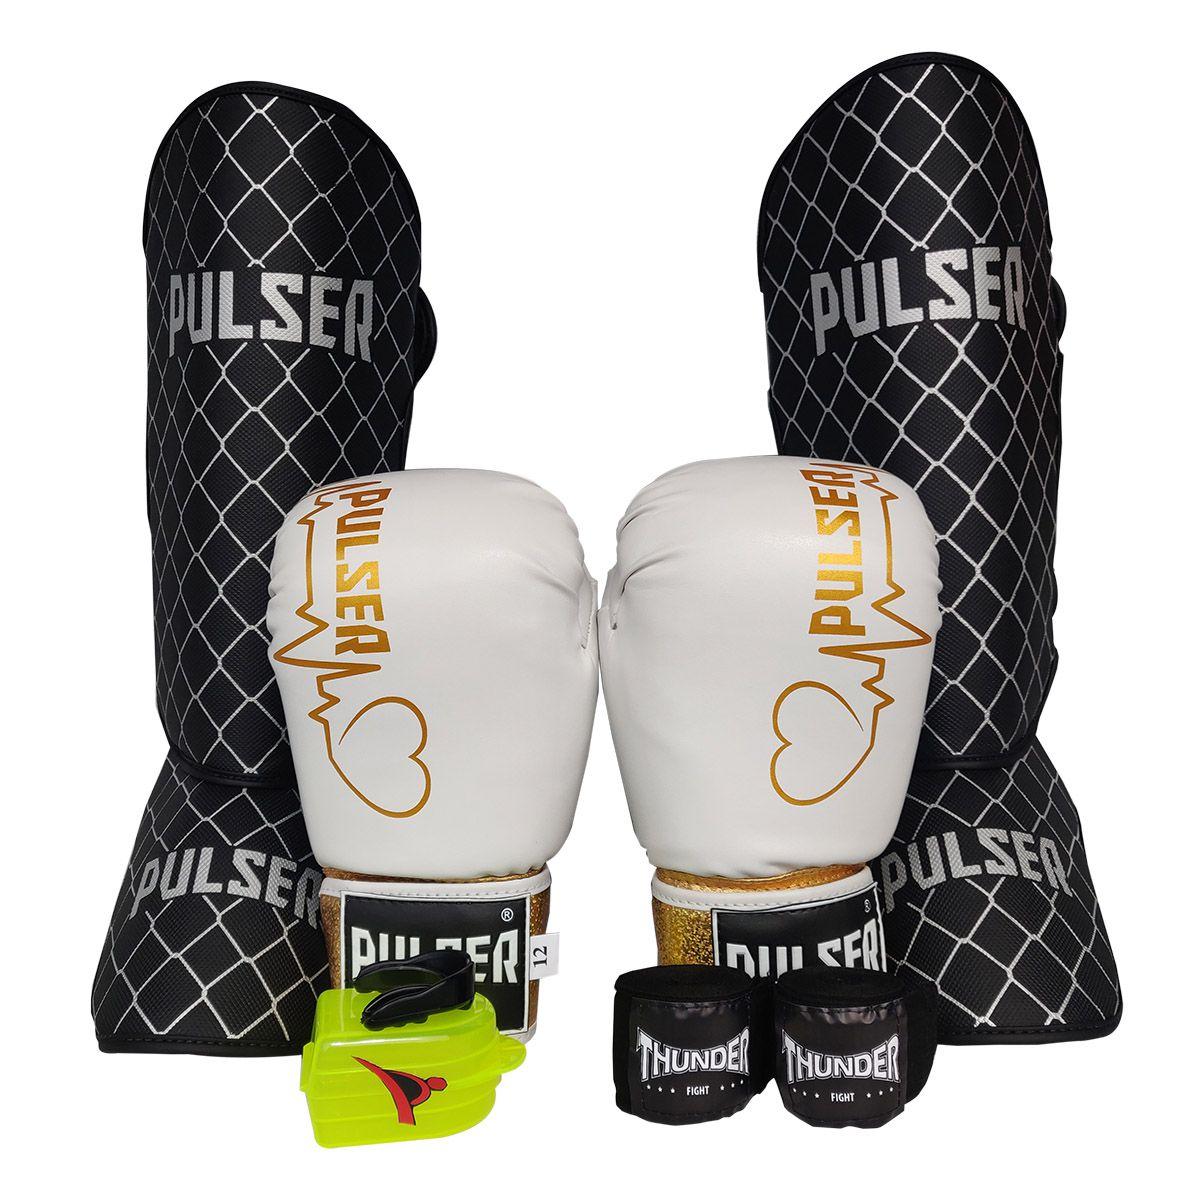 Kit de Muay Thai / Kickboxing Feminino 10oz - Preto e Branco Coração - Pulser  - PRALUTA SHOP